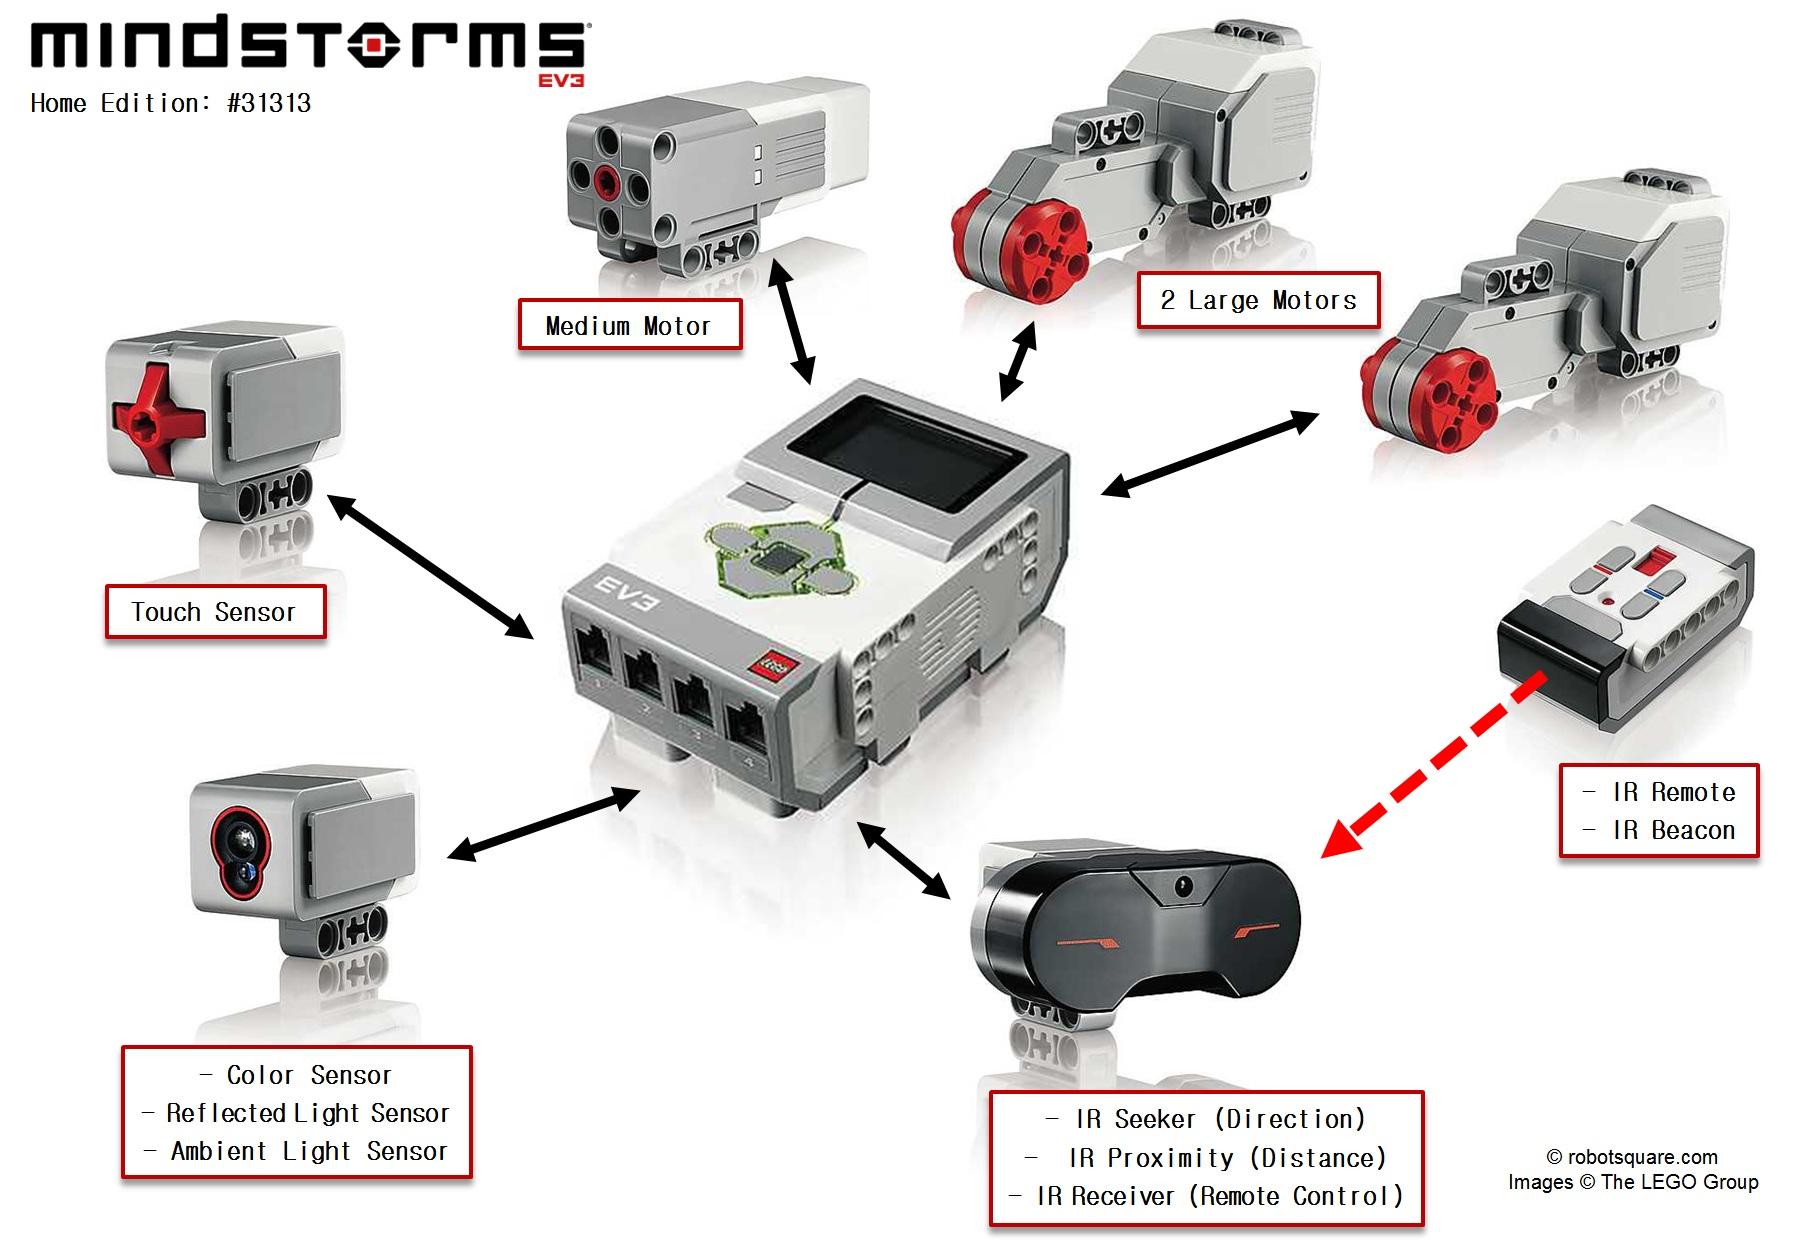 Ev3 hardware home edition 31313 robotsquare for Ev3 medium motor arm